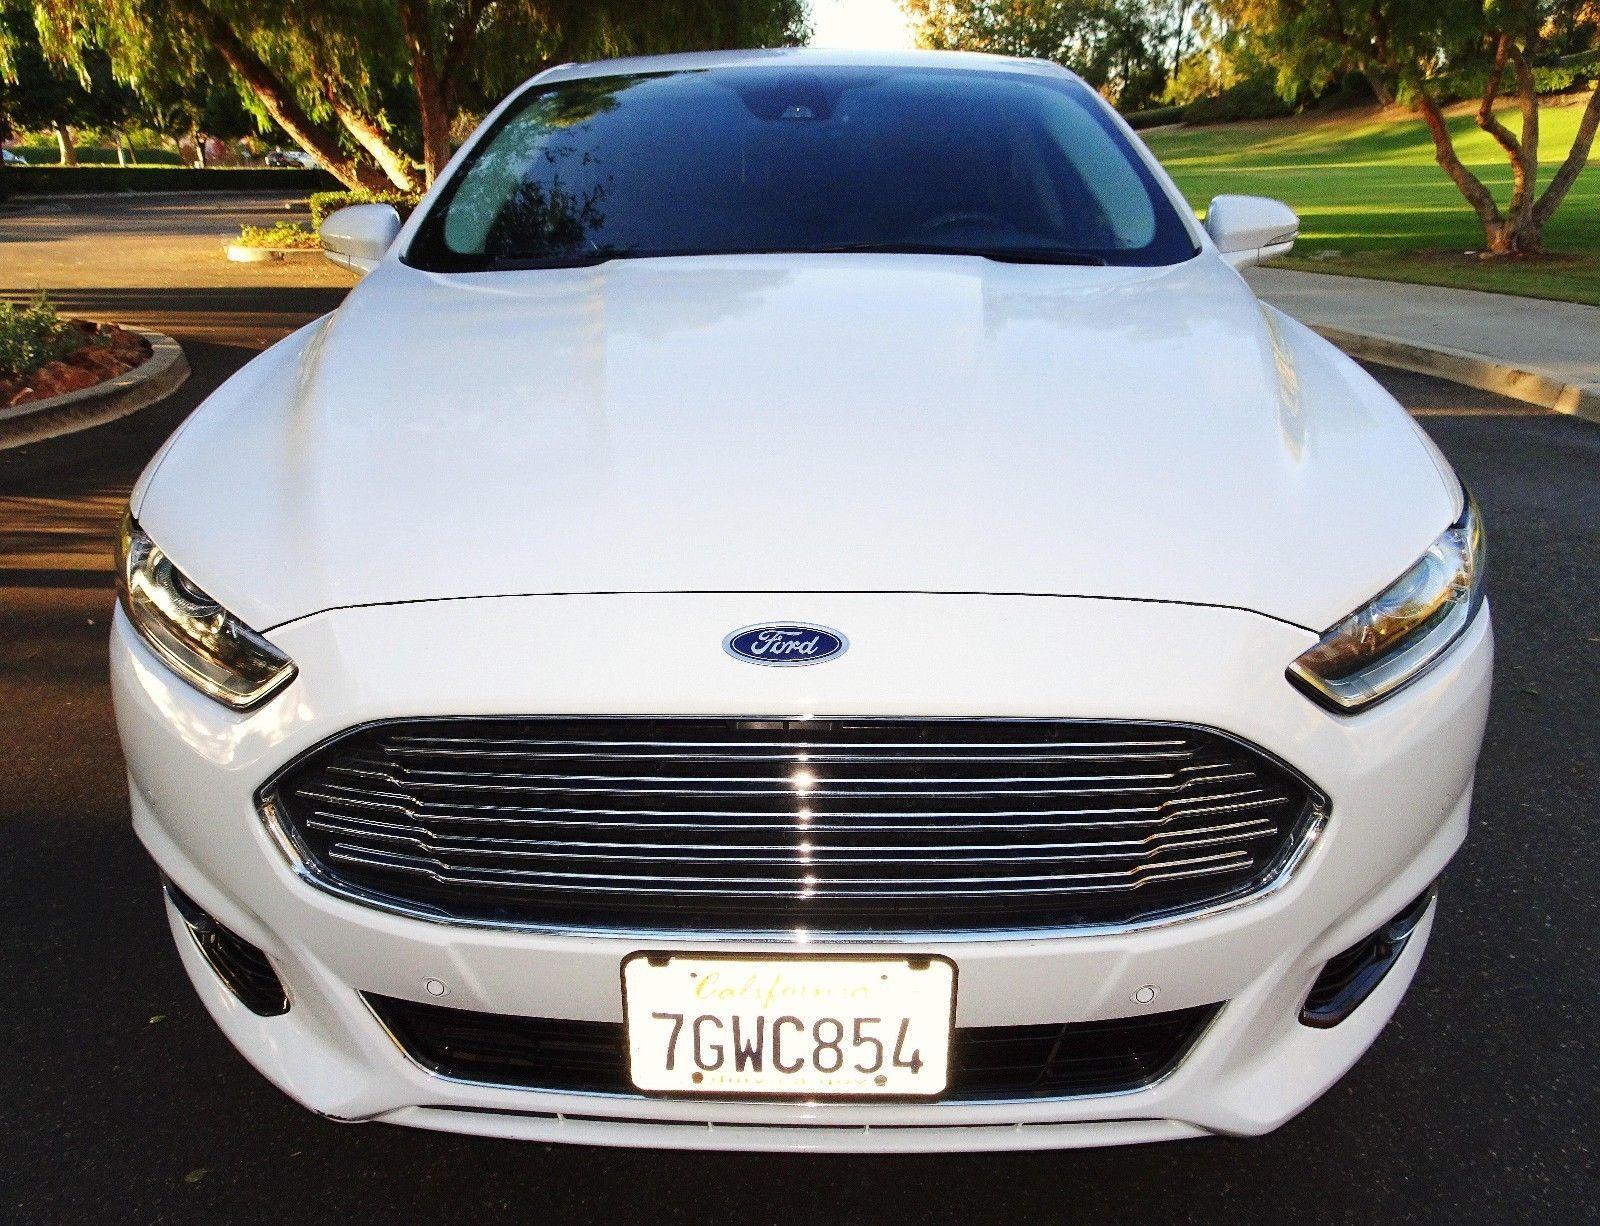 2015 Ford Fusion Energi Titanium Hybrids for sale